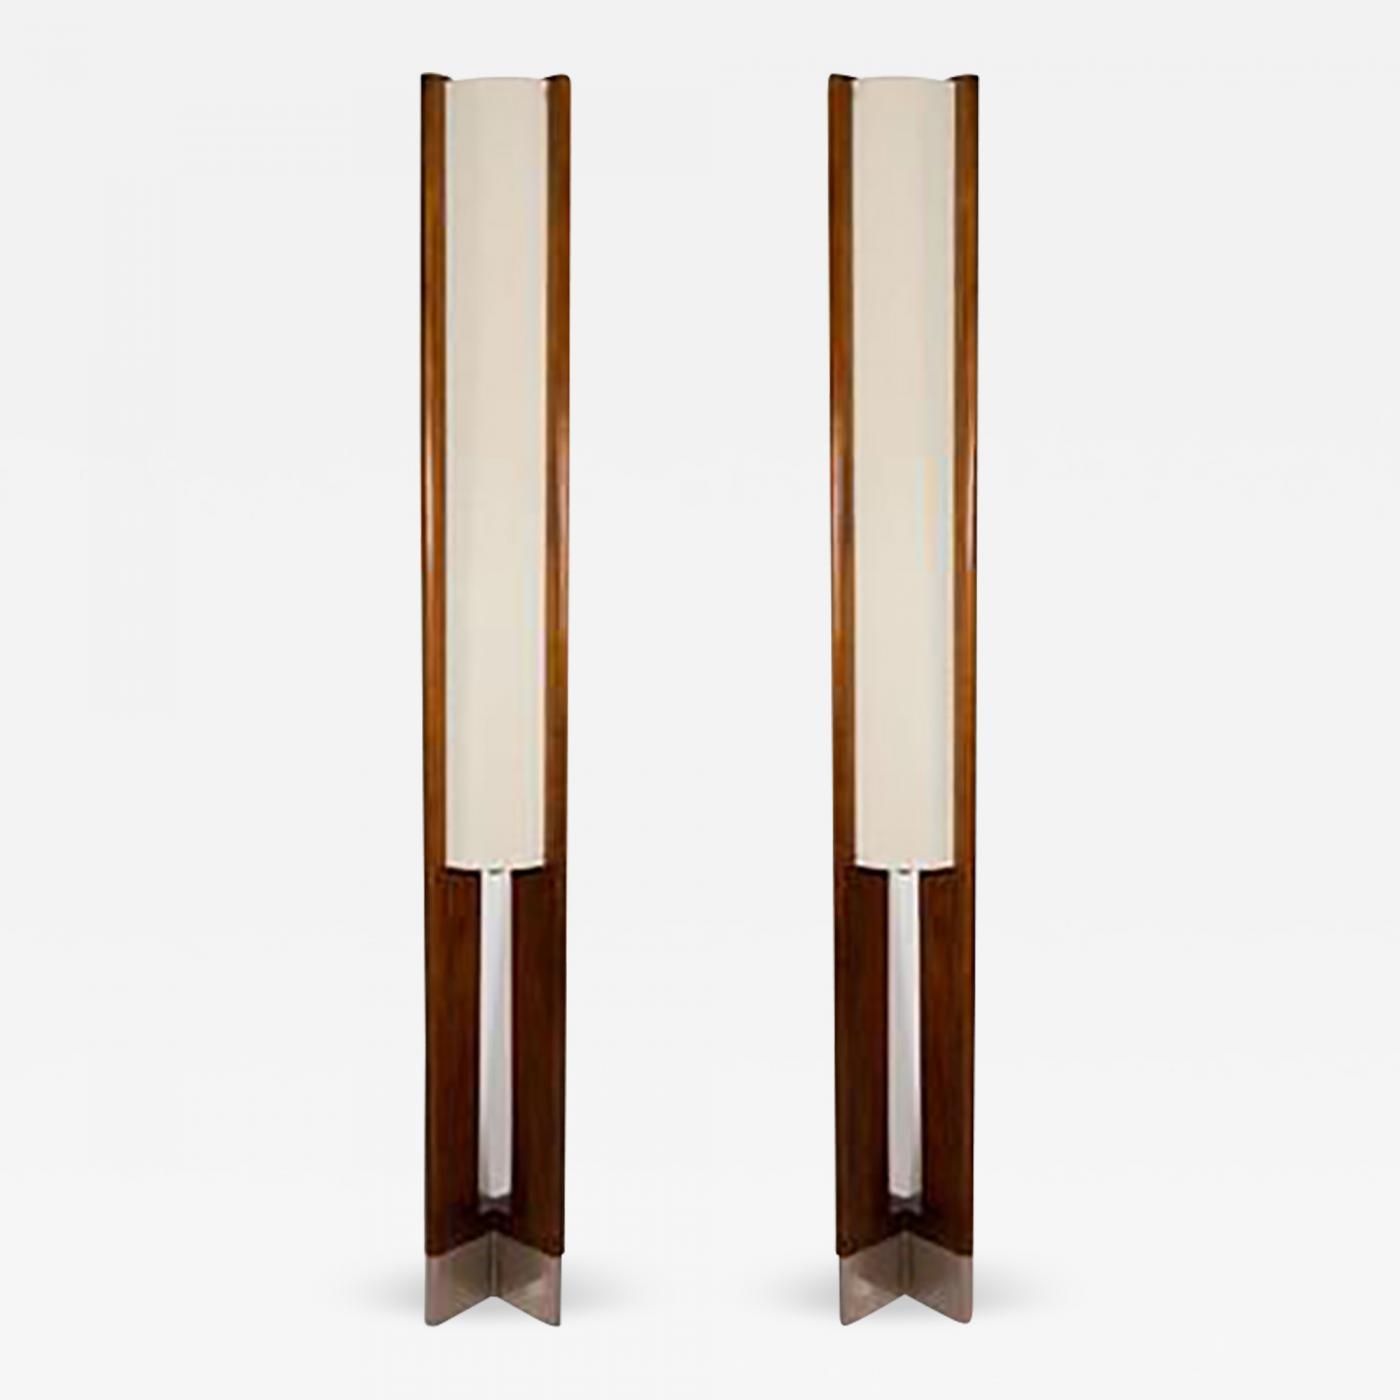 Danish Modern Pair Of Tall Wooden Floor Lamps